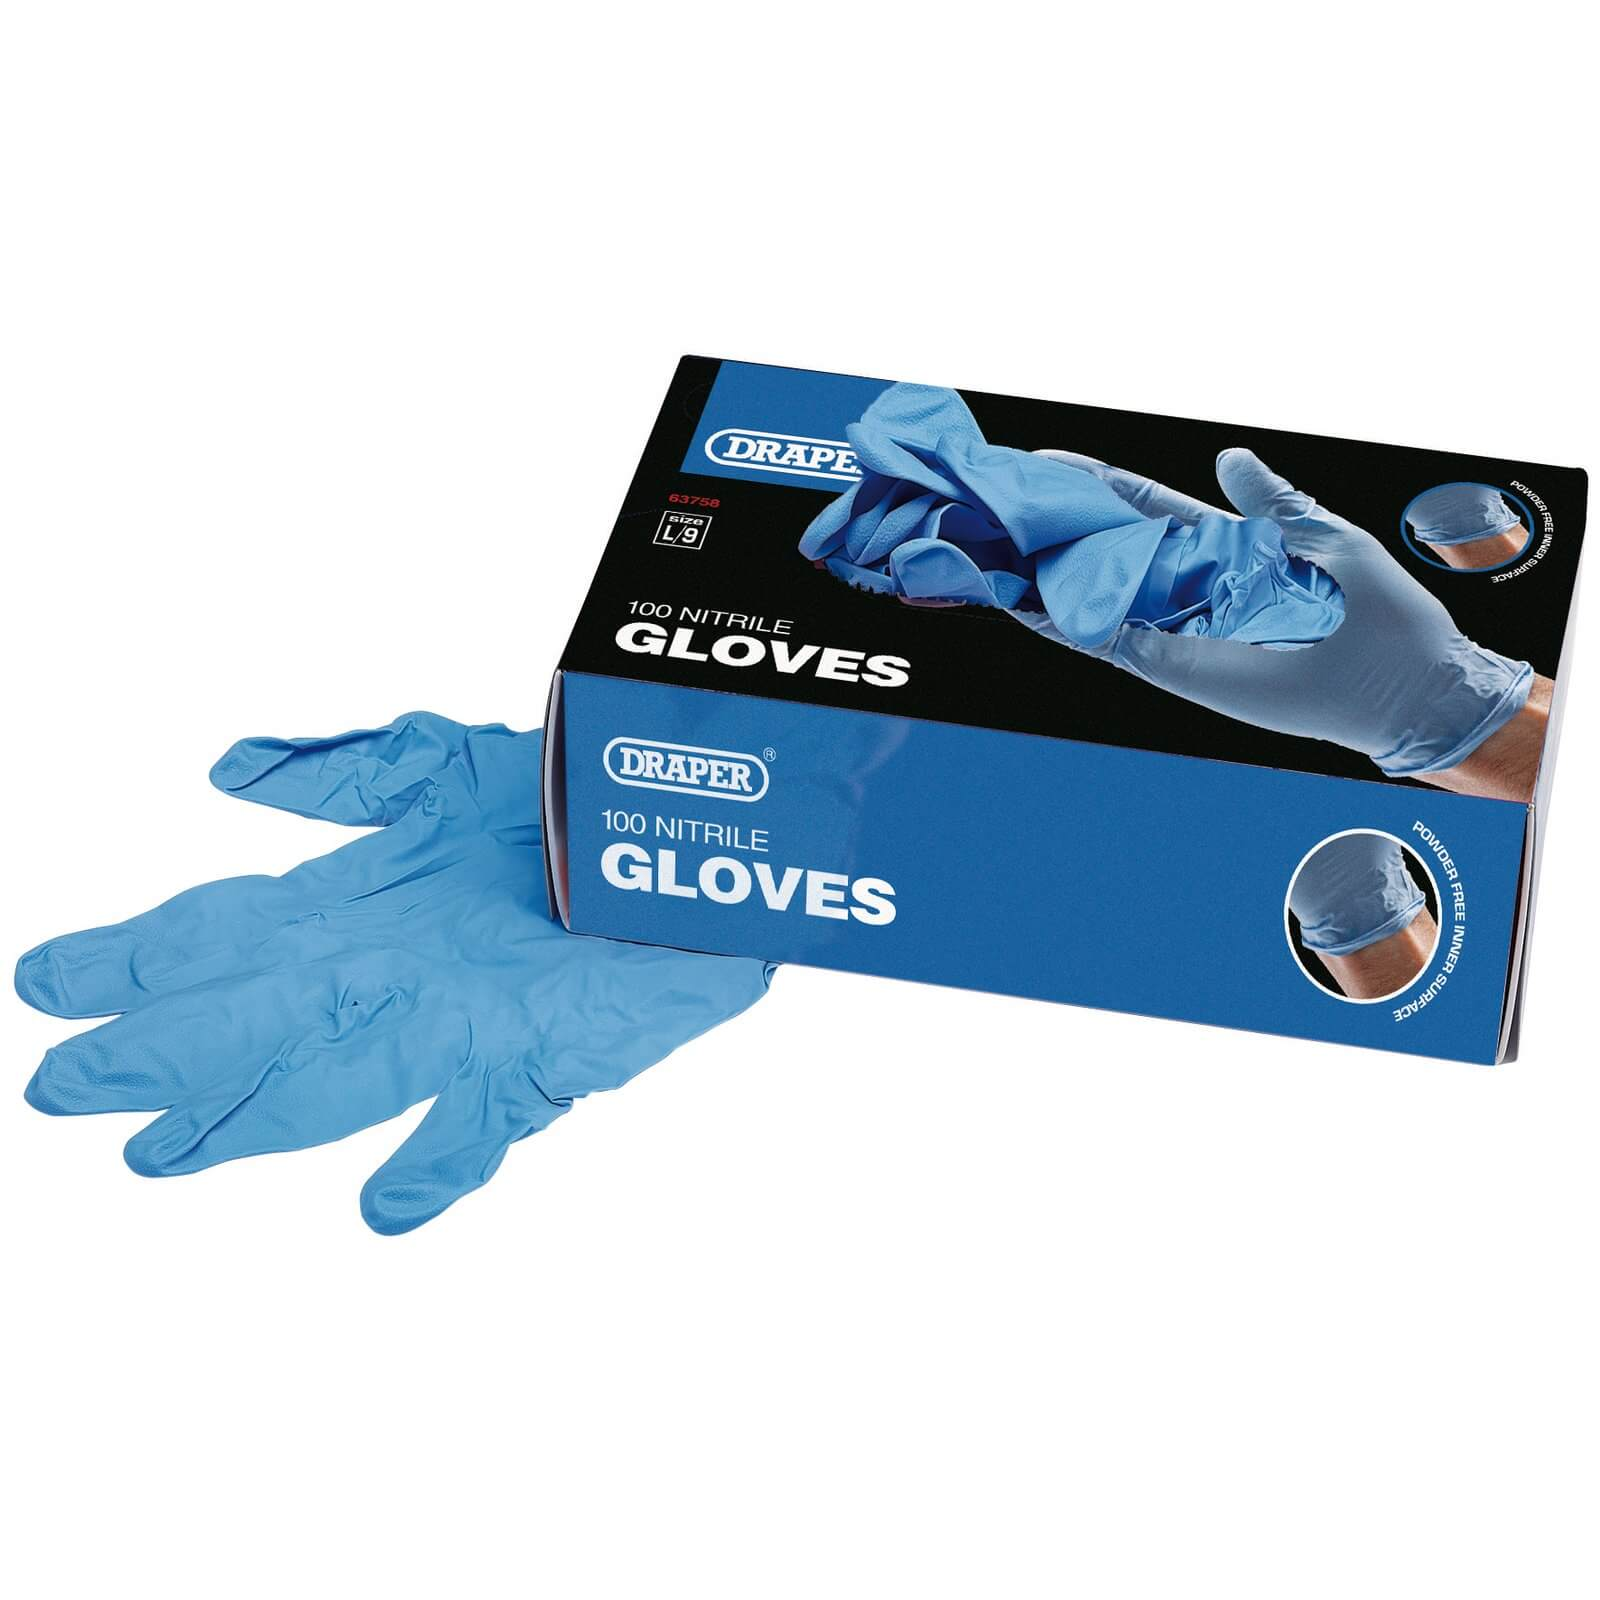 Image of Draper Nitrile Gloves L Pack of 100